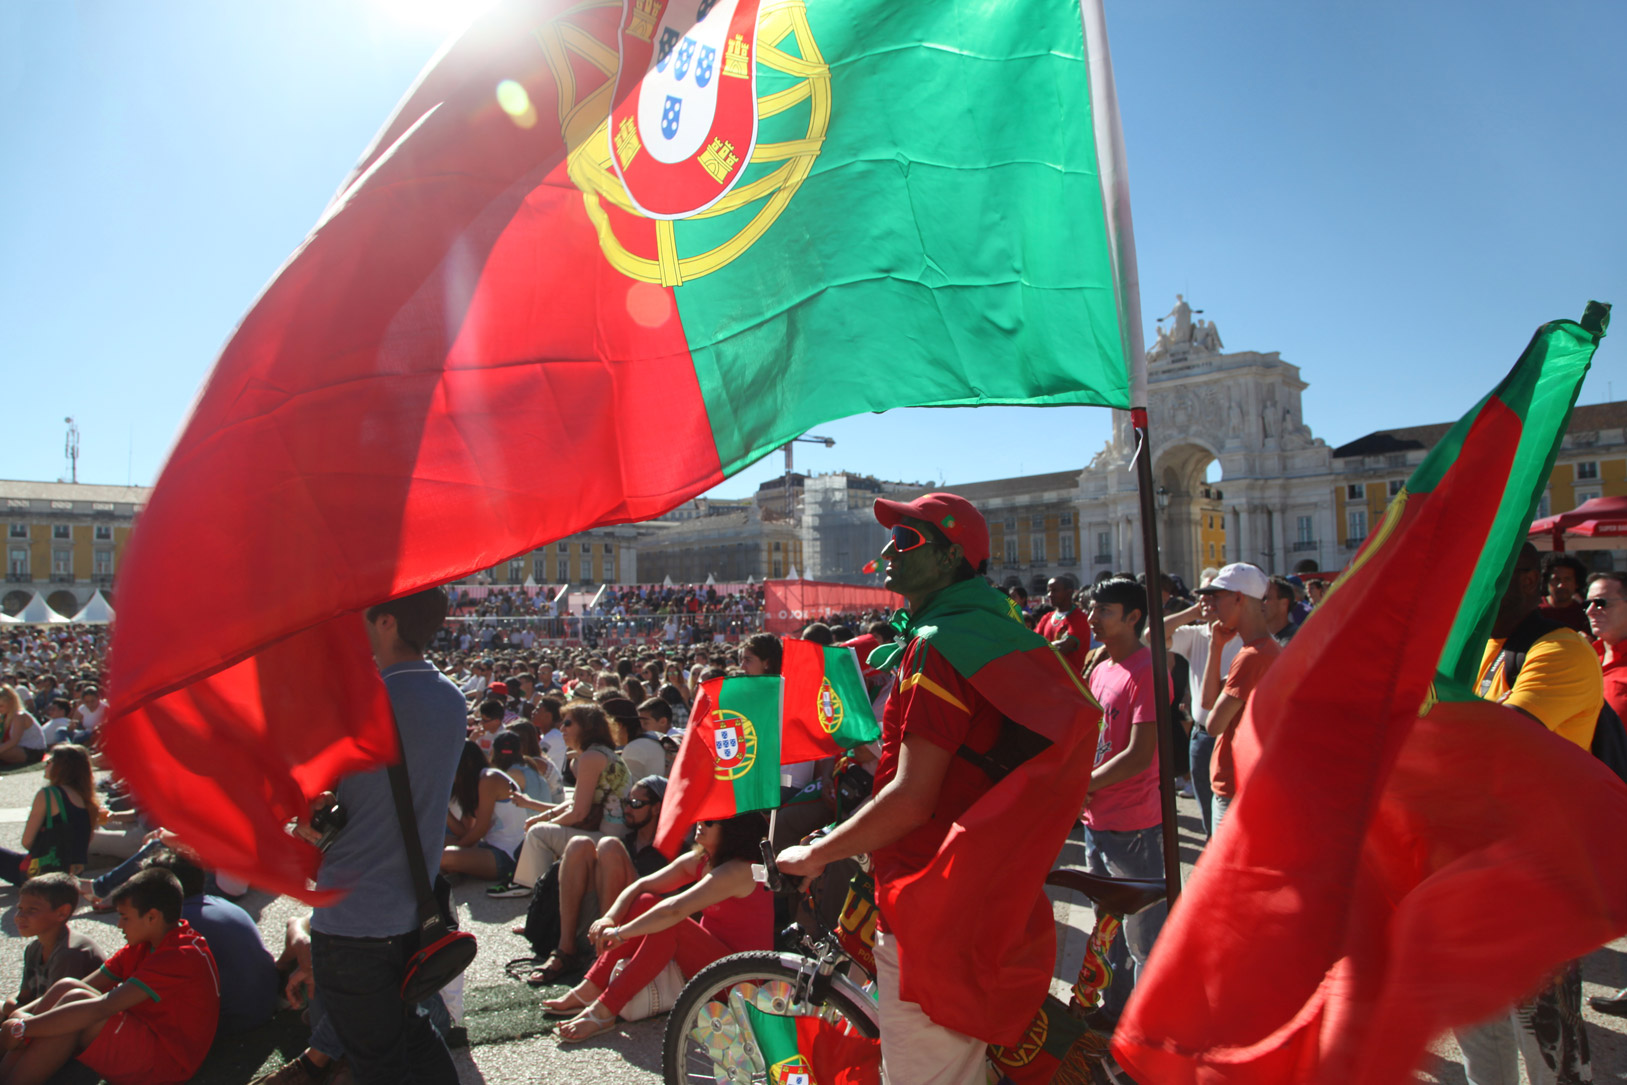 WK-westrijd Portugal-Ghana 2014 in Lissabon